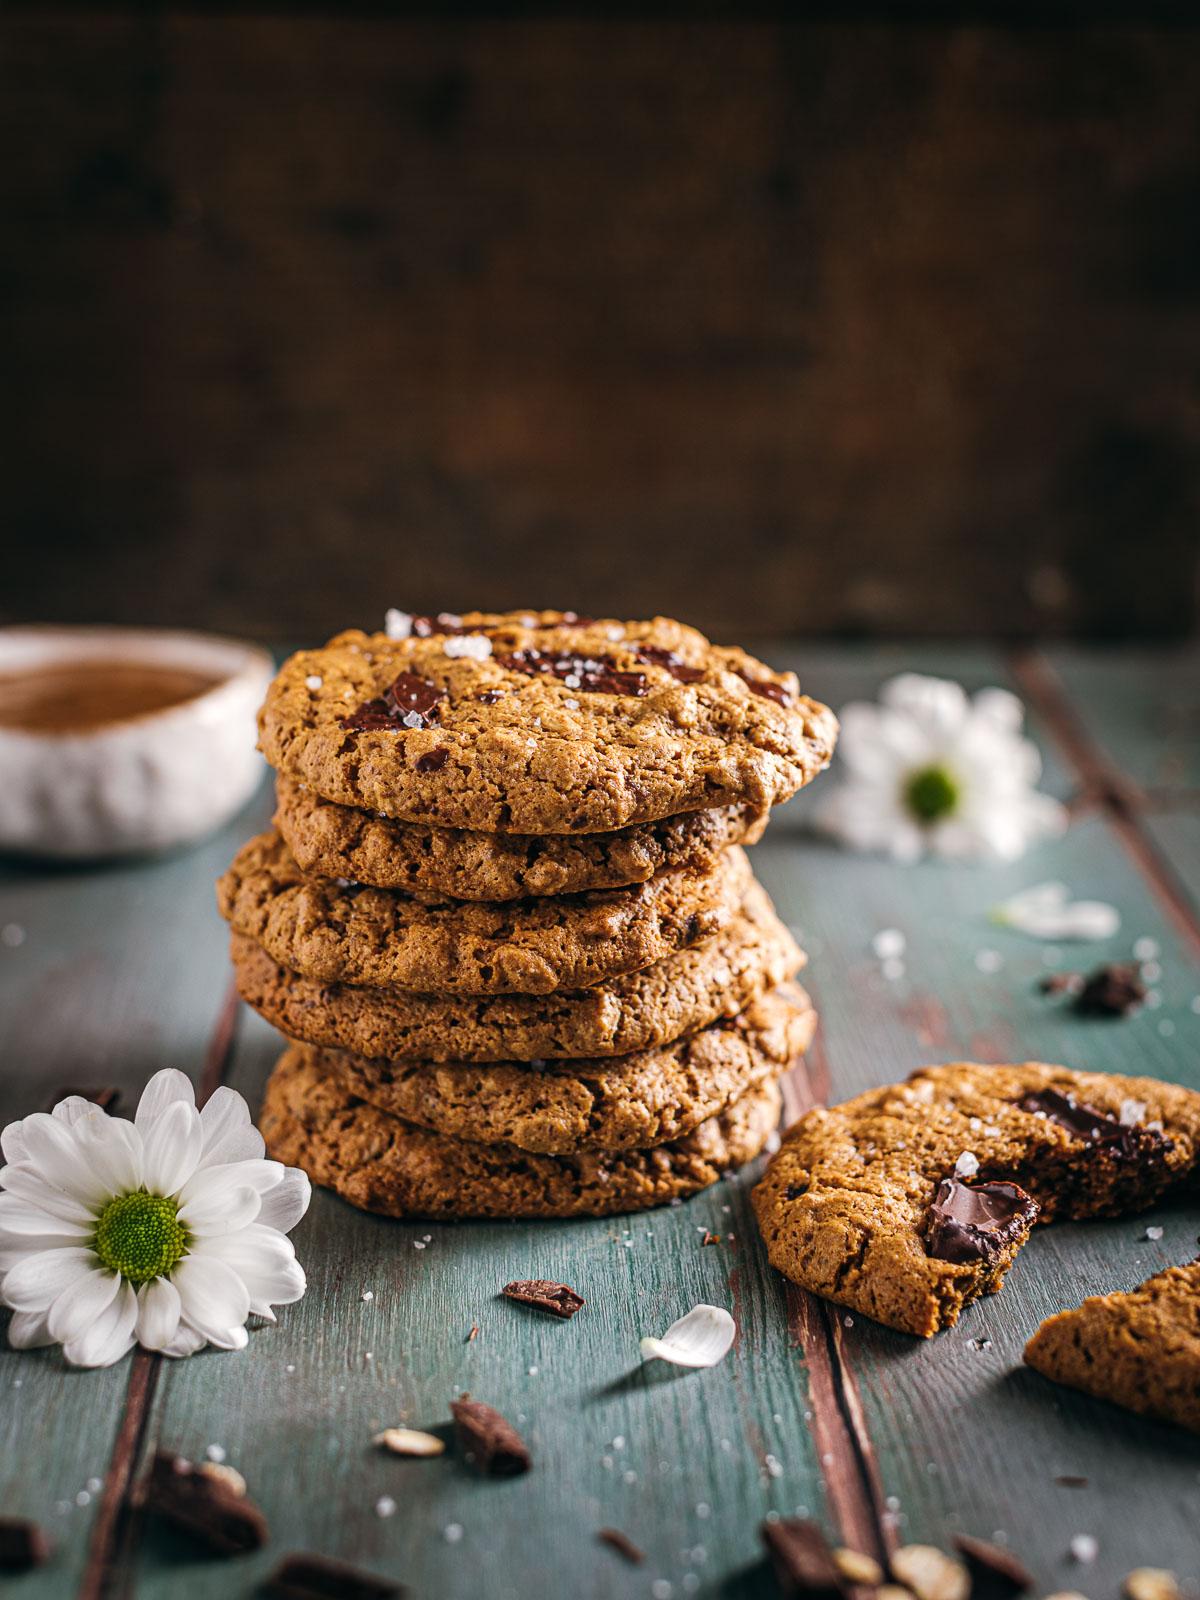 how to make Healthy Vegan Oatmeal Chocolate Chip Cookies recipe ricetta come fare Cookies vegani senza glutine al cioccolato integrali